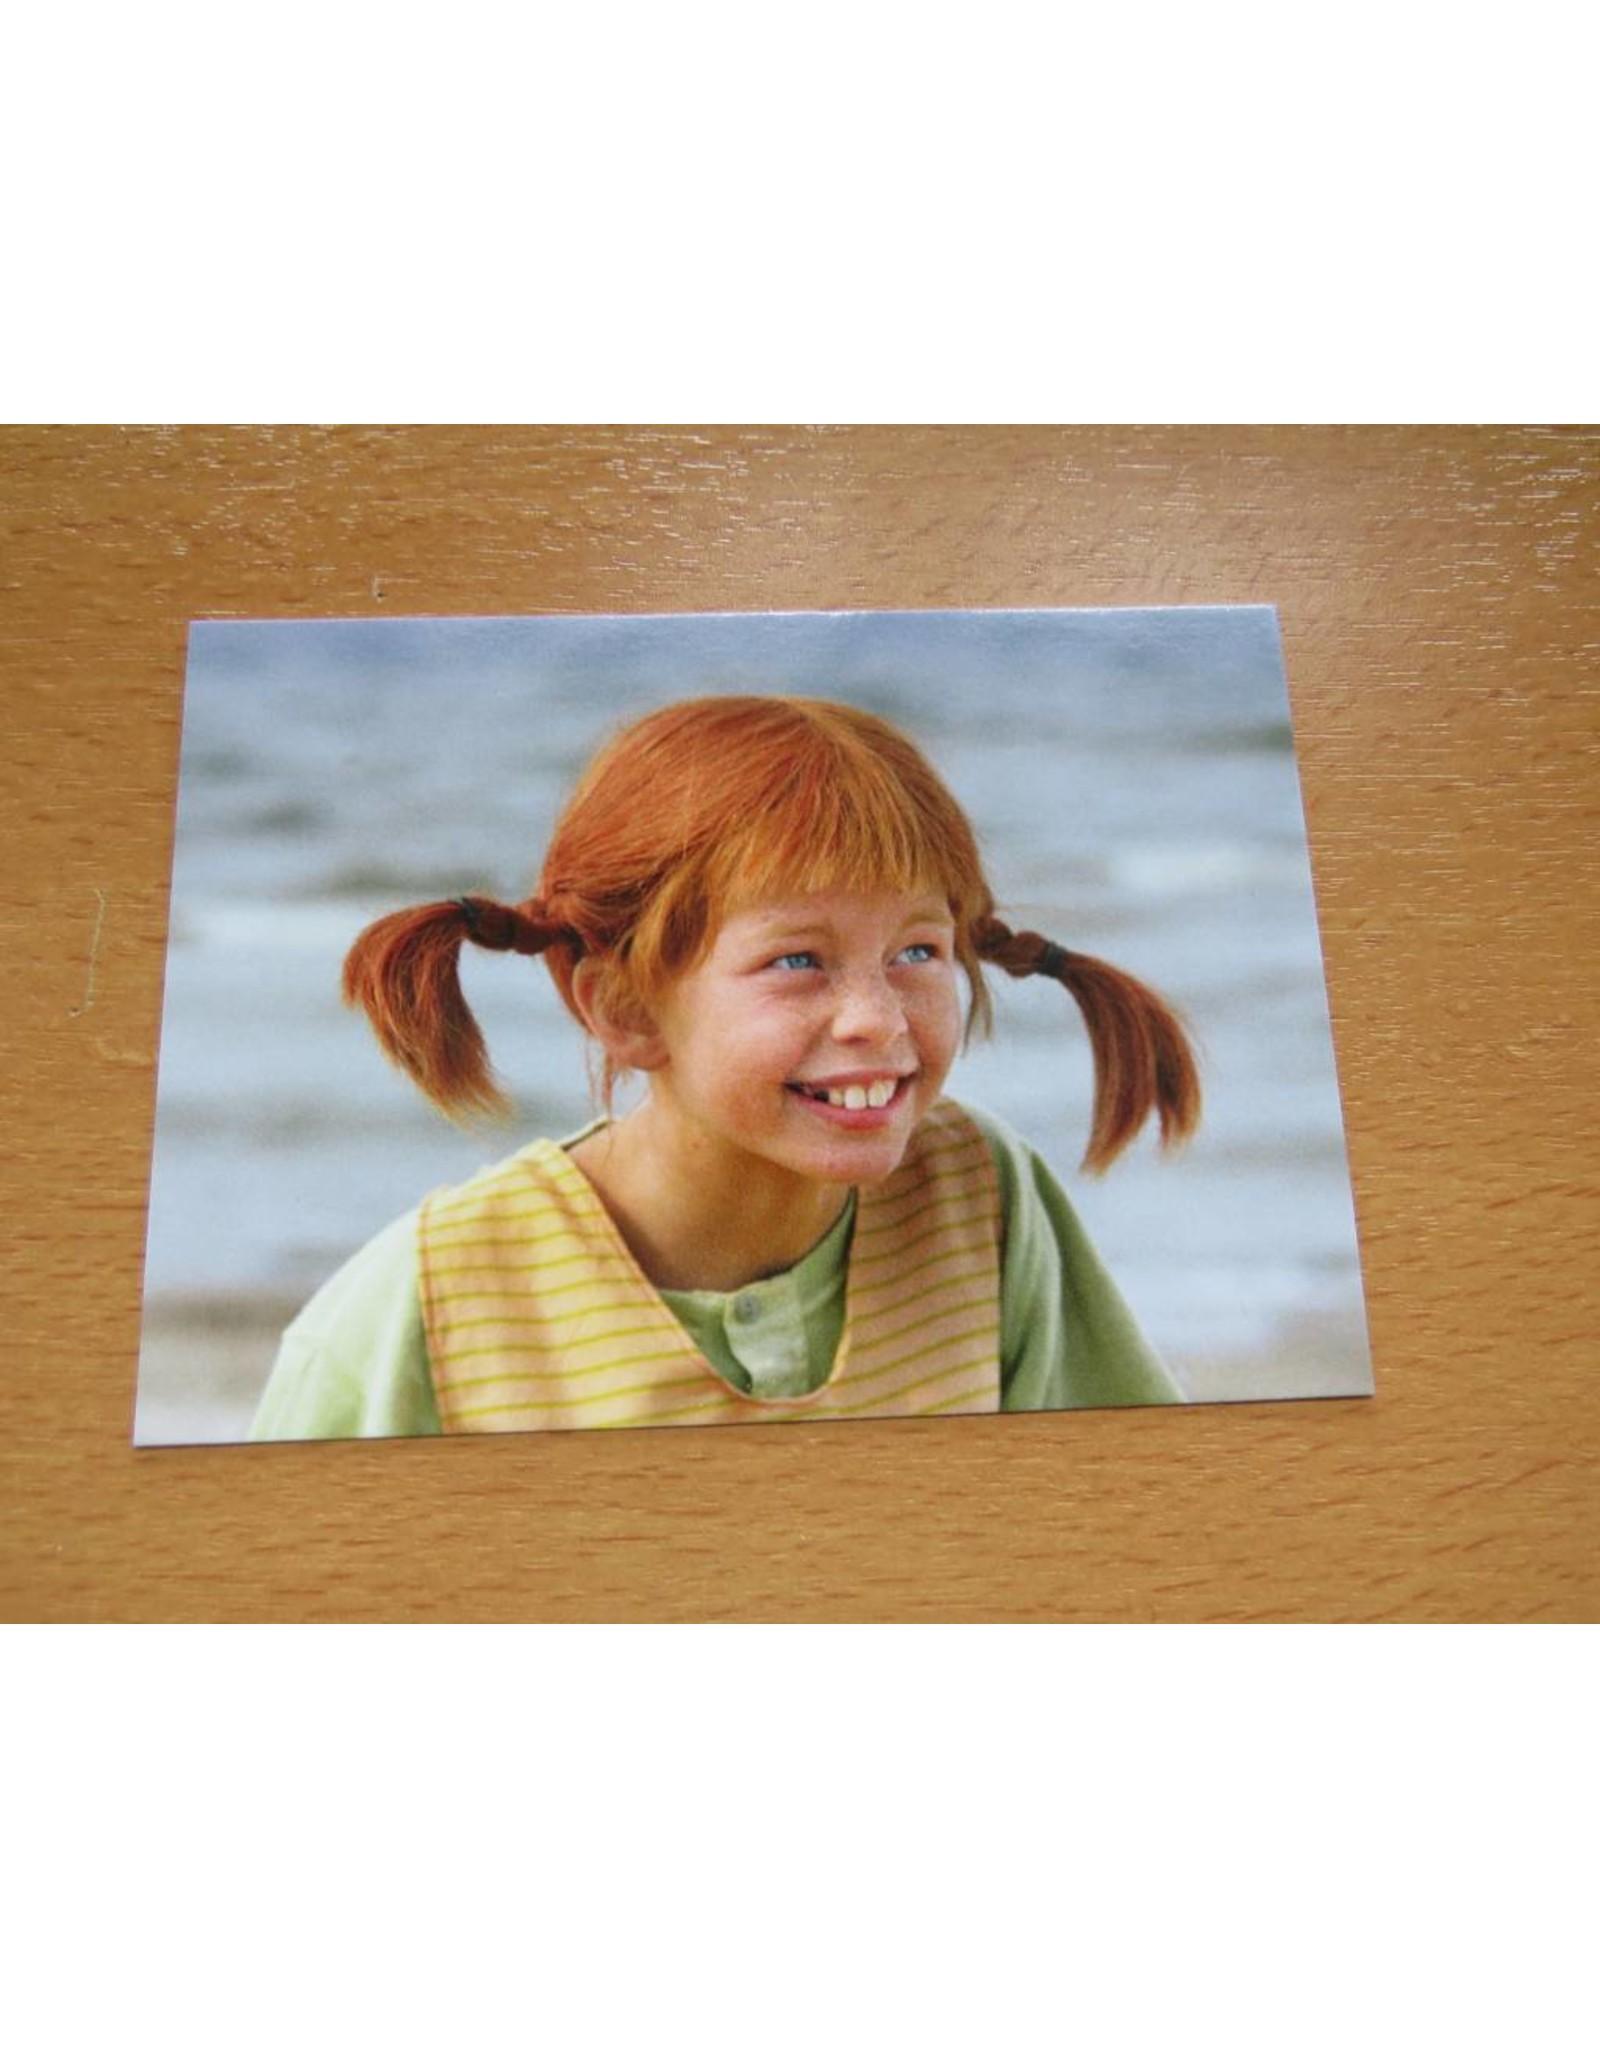 Pippi Langkous Pippi Langkous kaart - Lachend